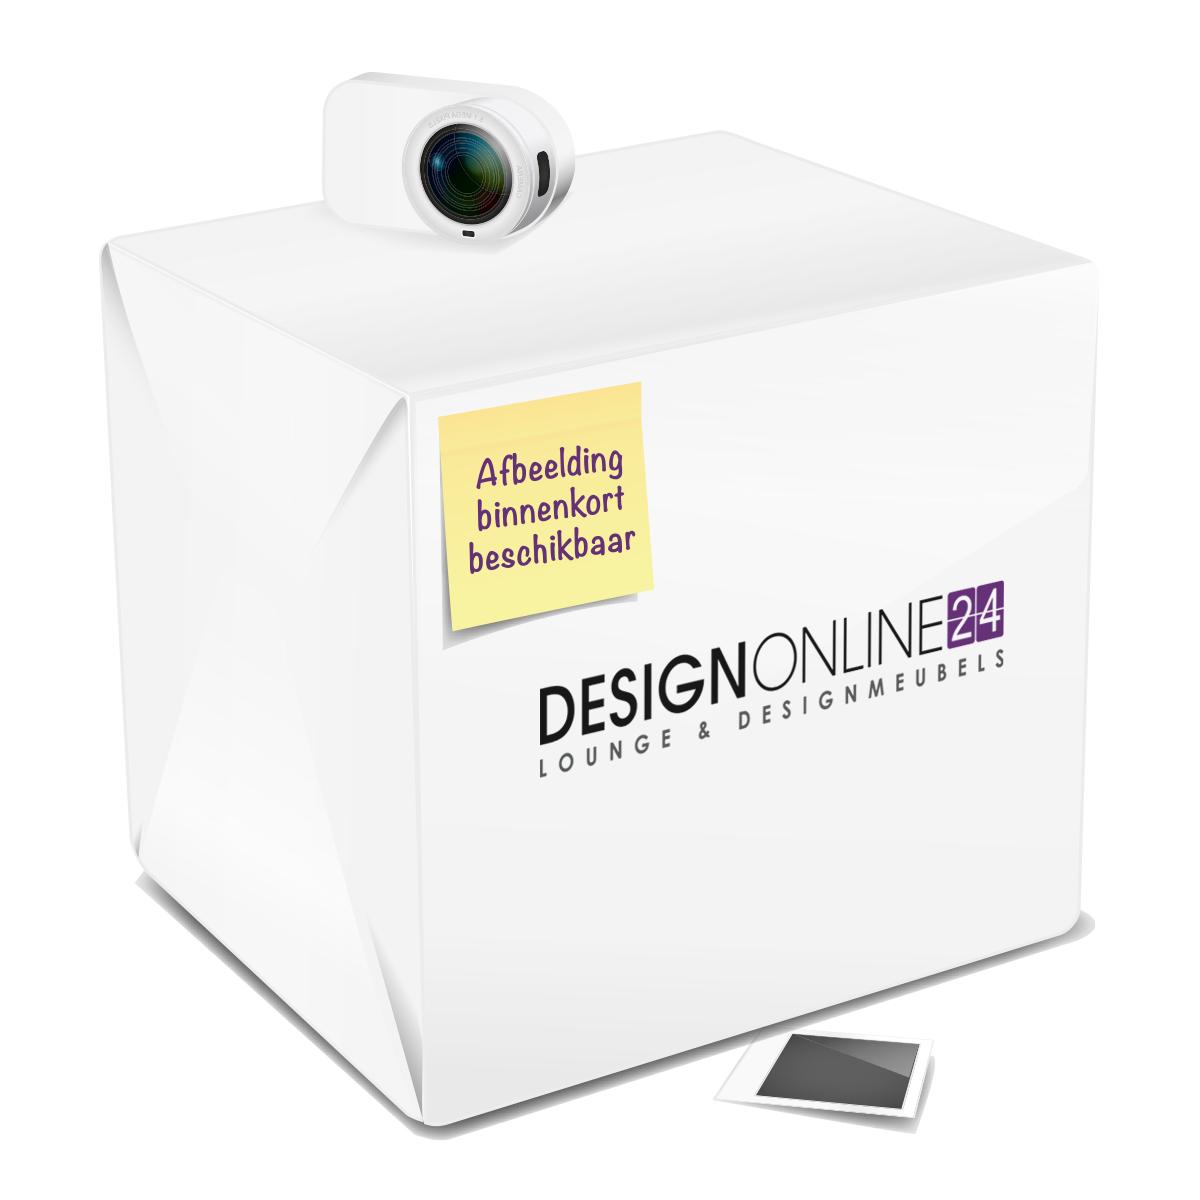 24Designs 24Designs Barkruk Tessa - Zithoogte 85 cm - Mat RVS onderstel - Kunstleren zitting - Rood